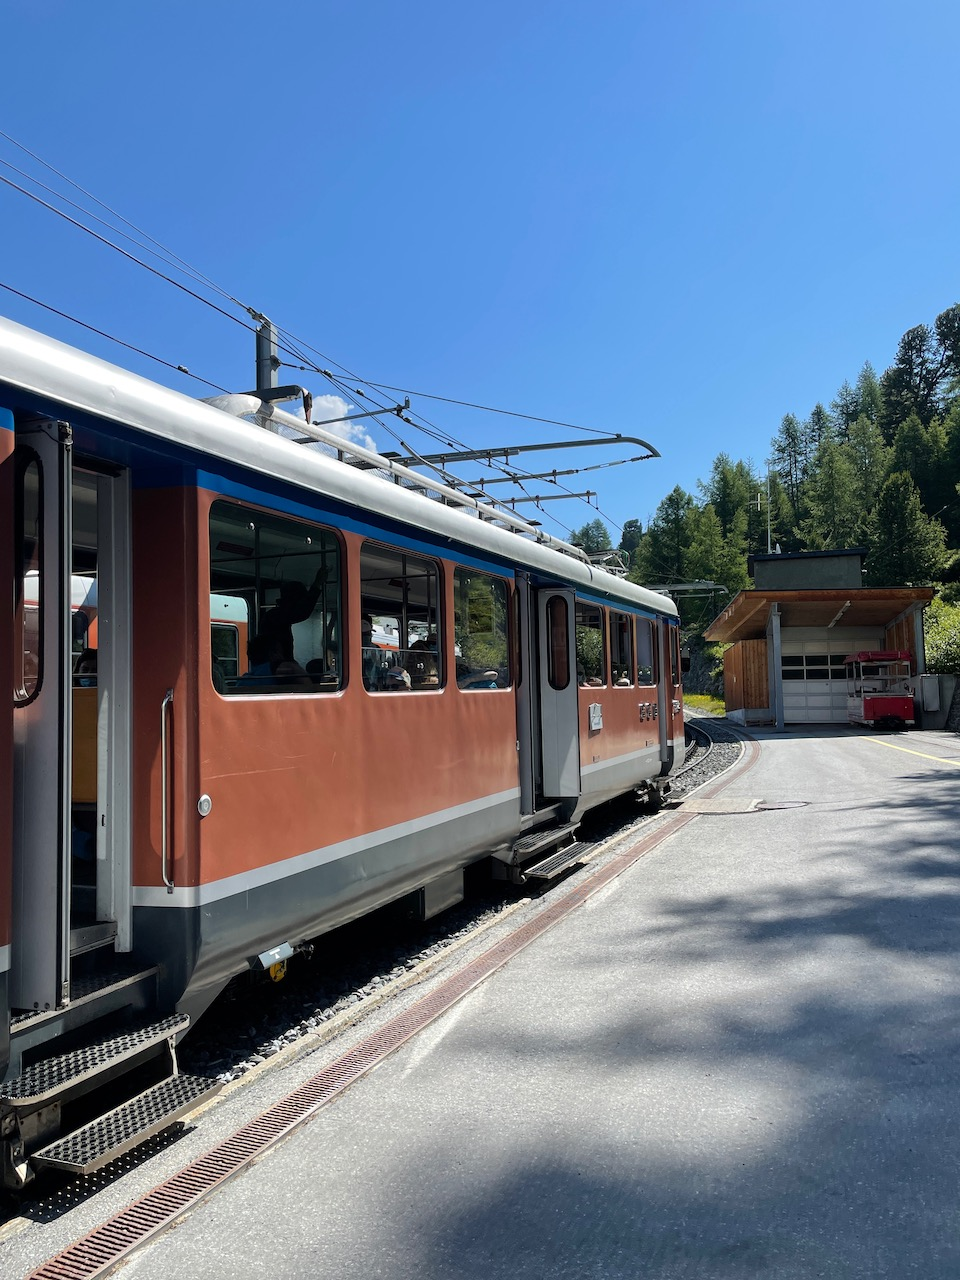 Gornergrat Bahn to the Riffelalp